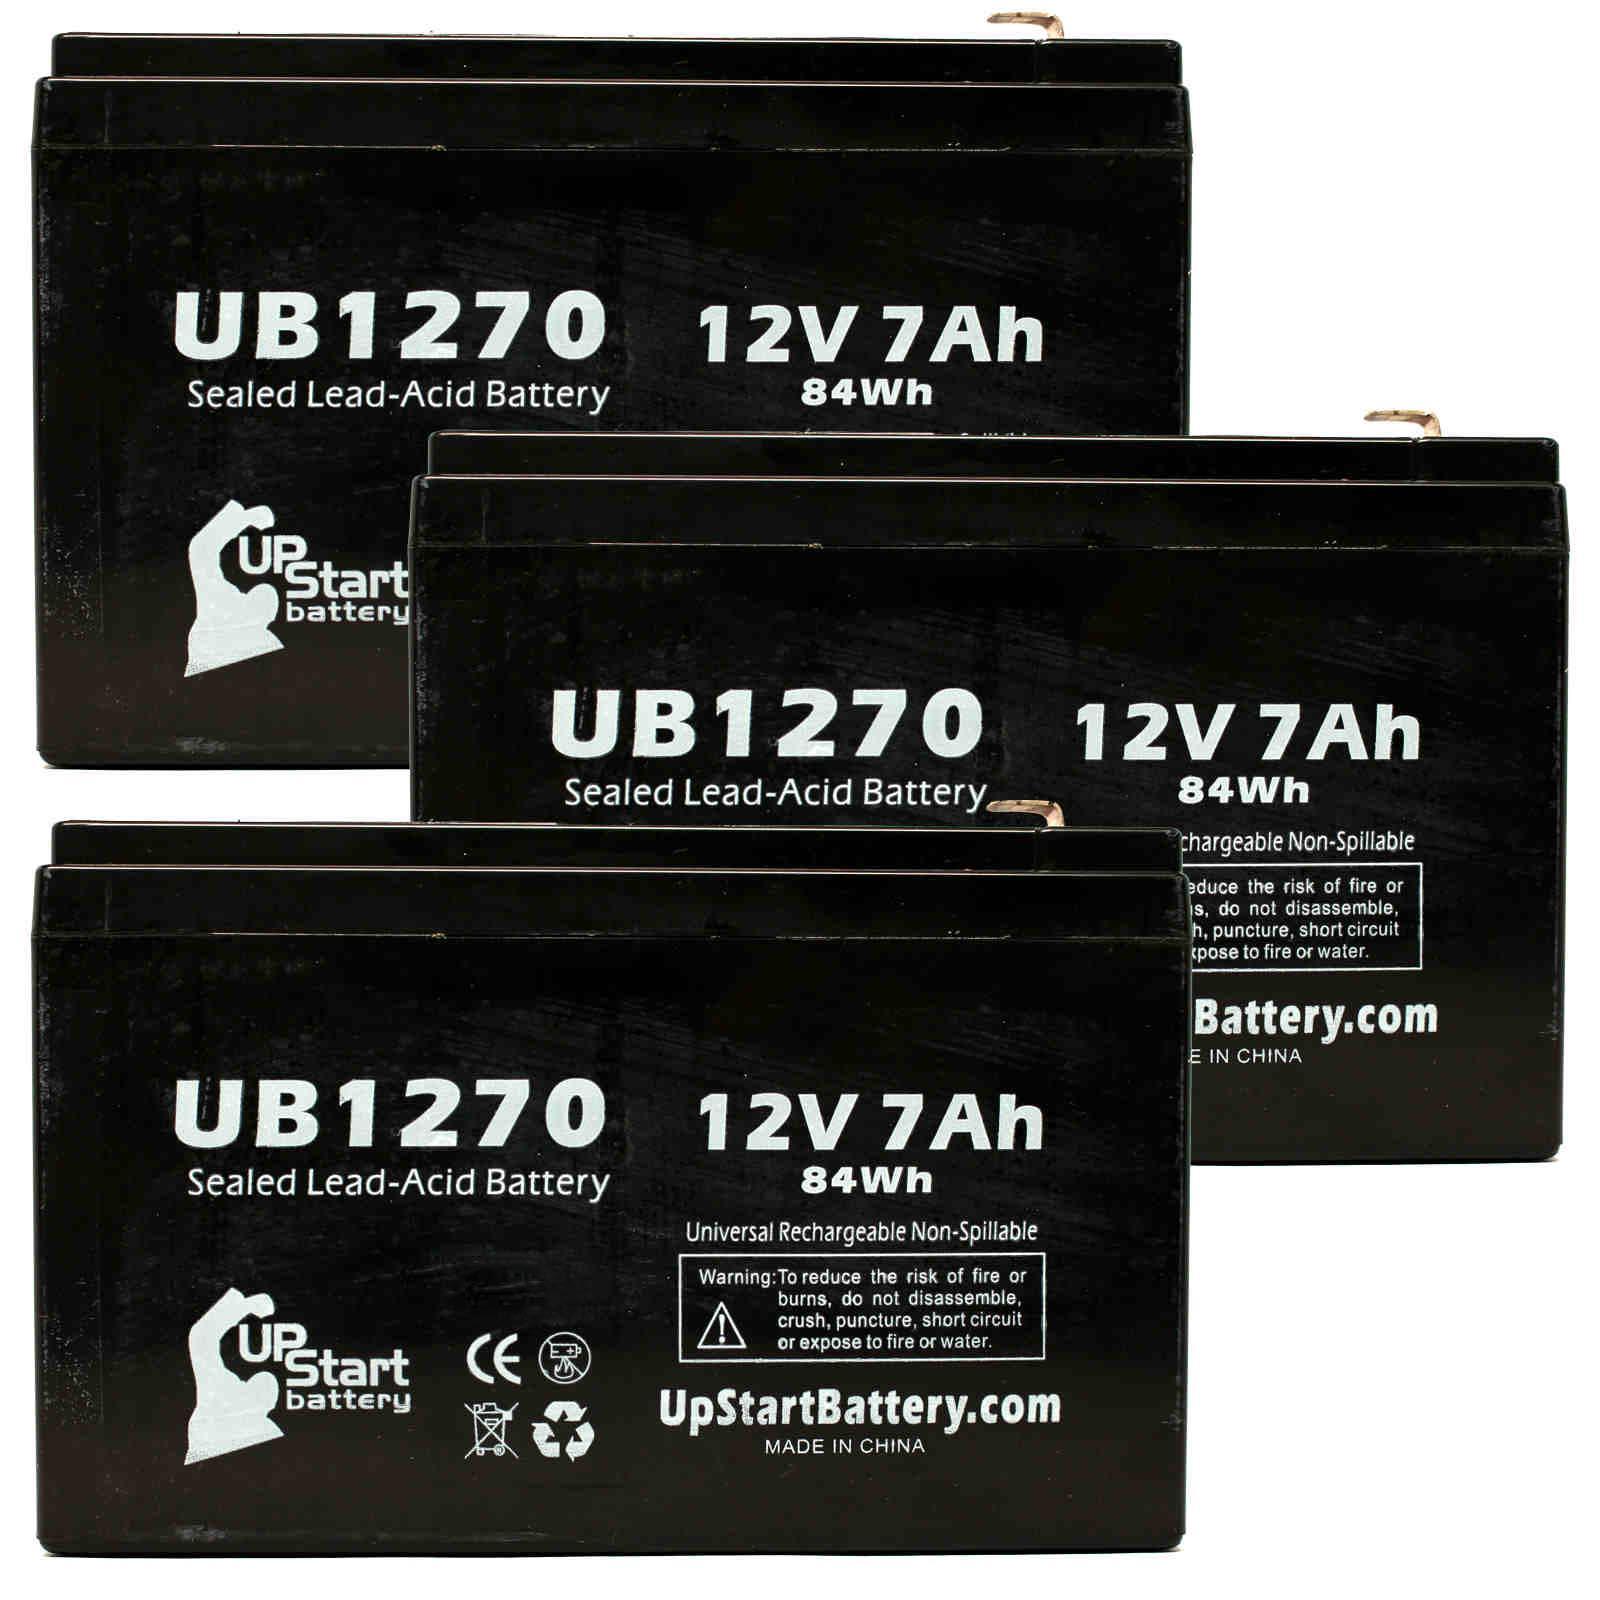 UpStart Battery 3x Pack - Panasonic LCR4512P Battery Repl...